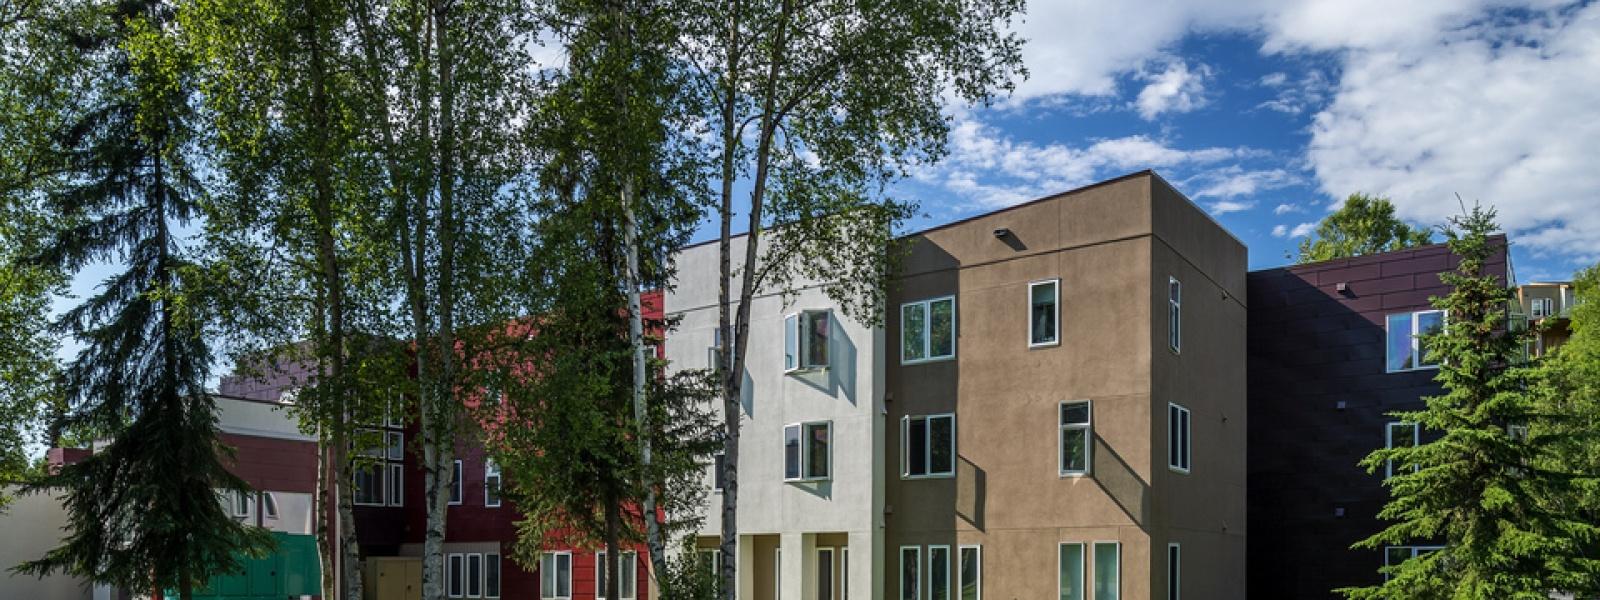 8901 Peck Avenue, Anchorage, Alaska, 99504, 1 Bedroom Bedrooms, ,1 BathroomBathrooms,Apartment,For Rent,Peck Avenue,1014